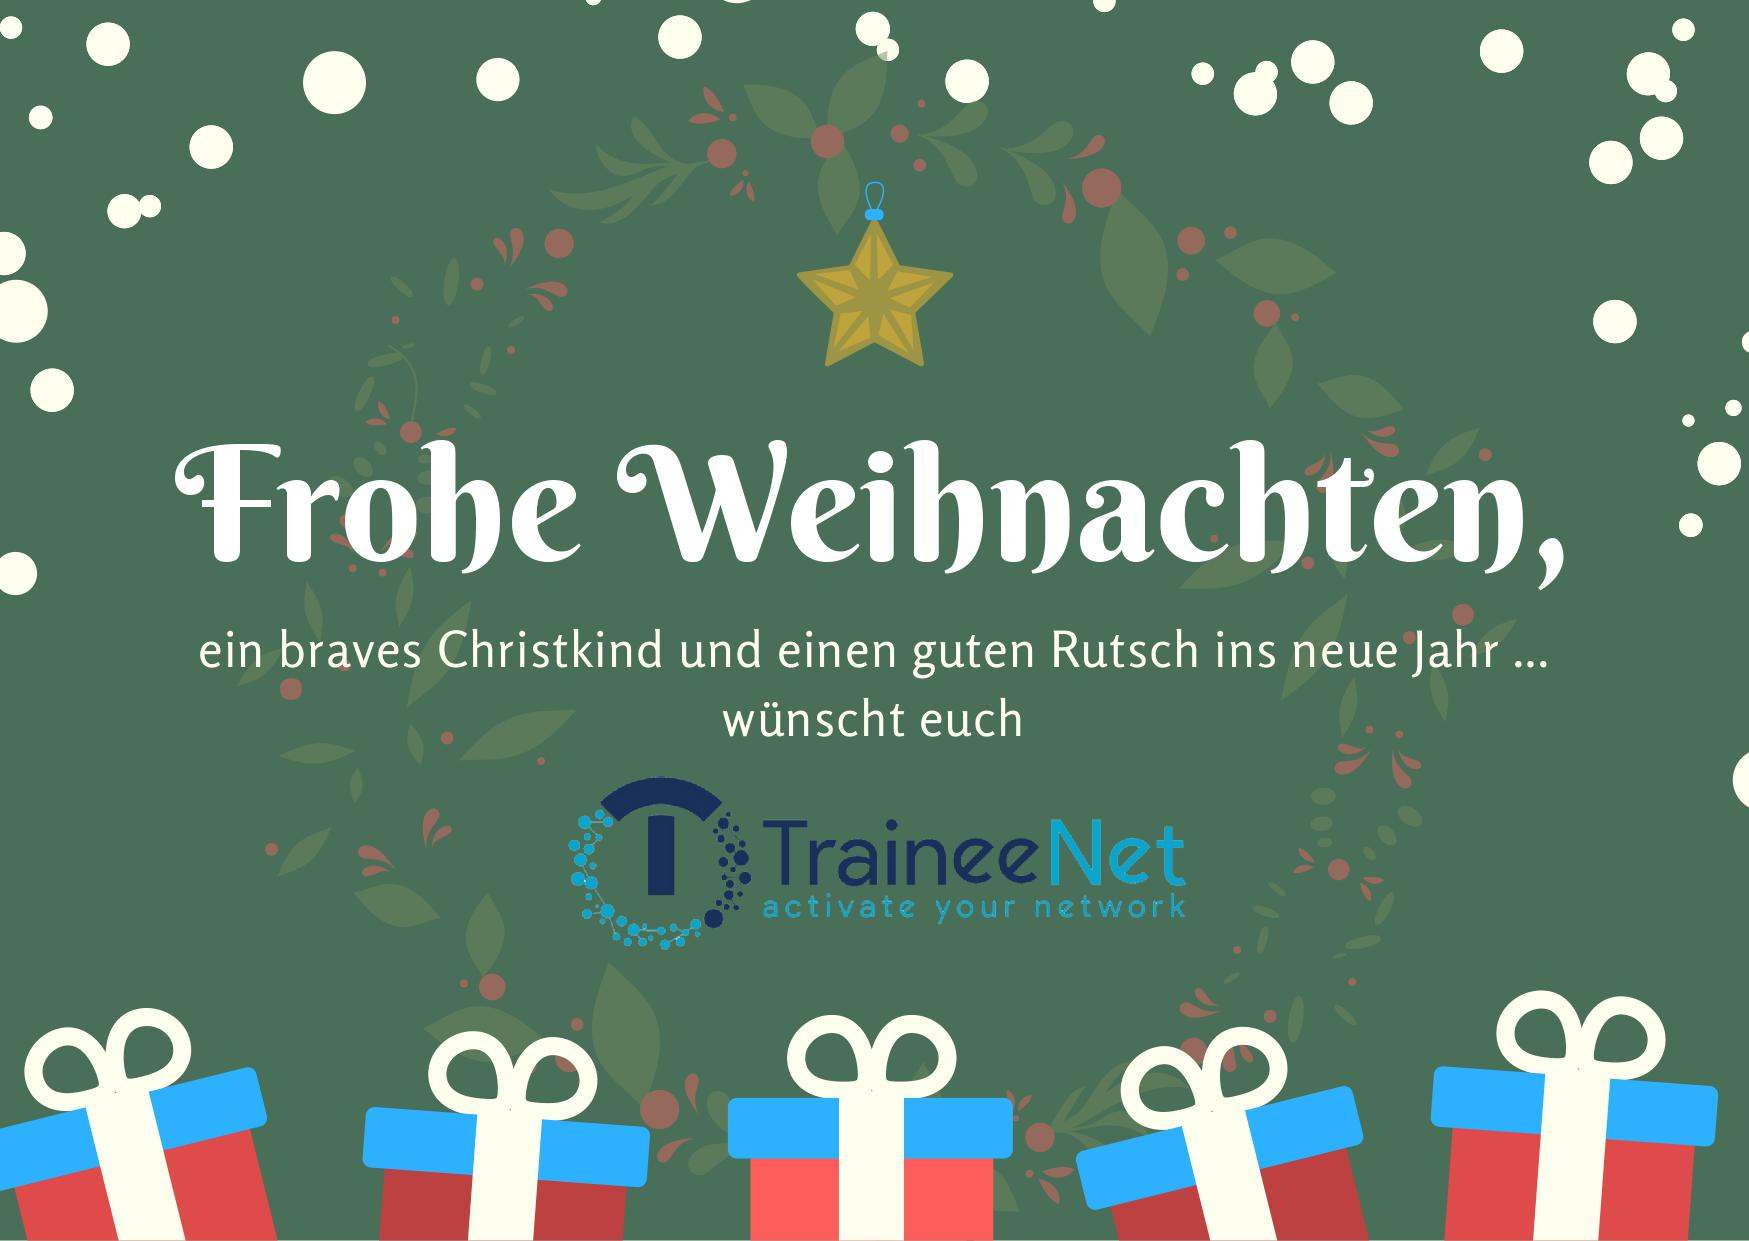 Frohe Weihnachten wünscht TraineeNet!